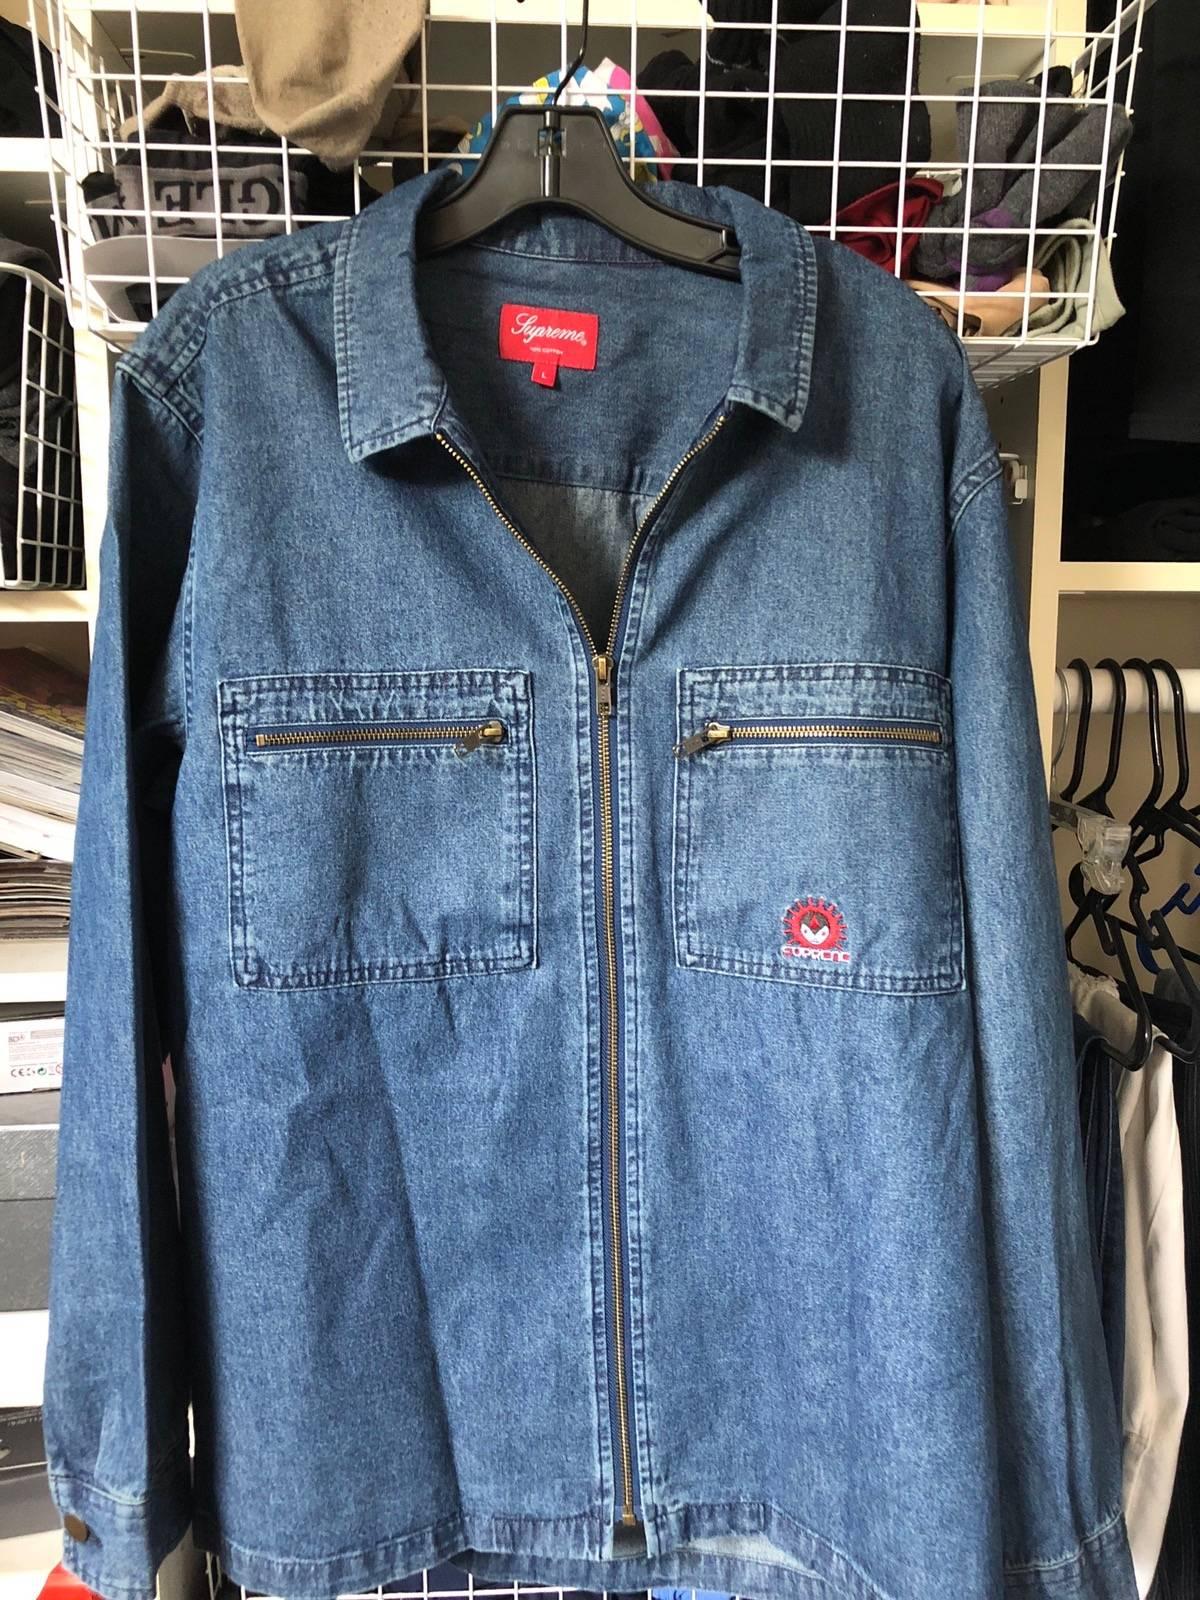 fc545e651b Supreme Vampire Denim Jacket Size l - Denim Jackets for Sale - Grailed